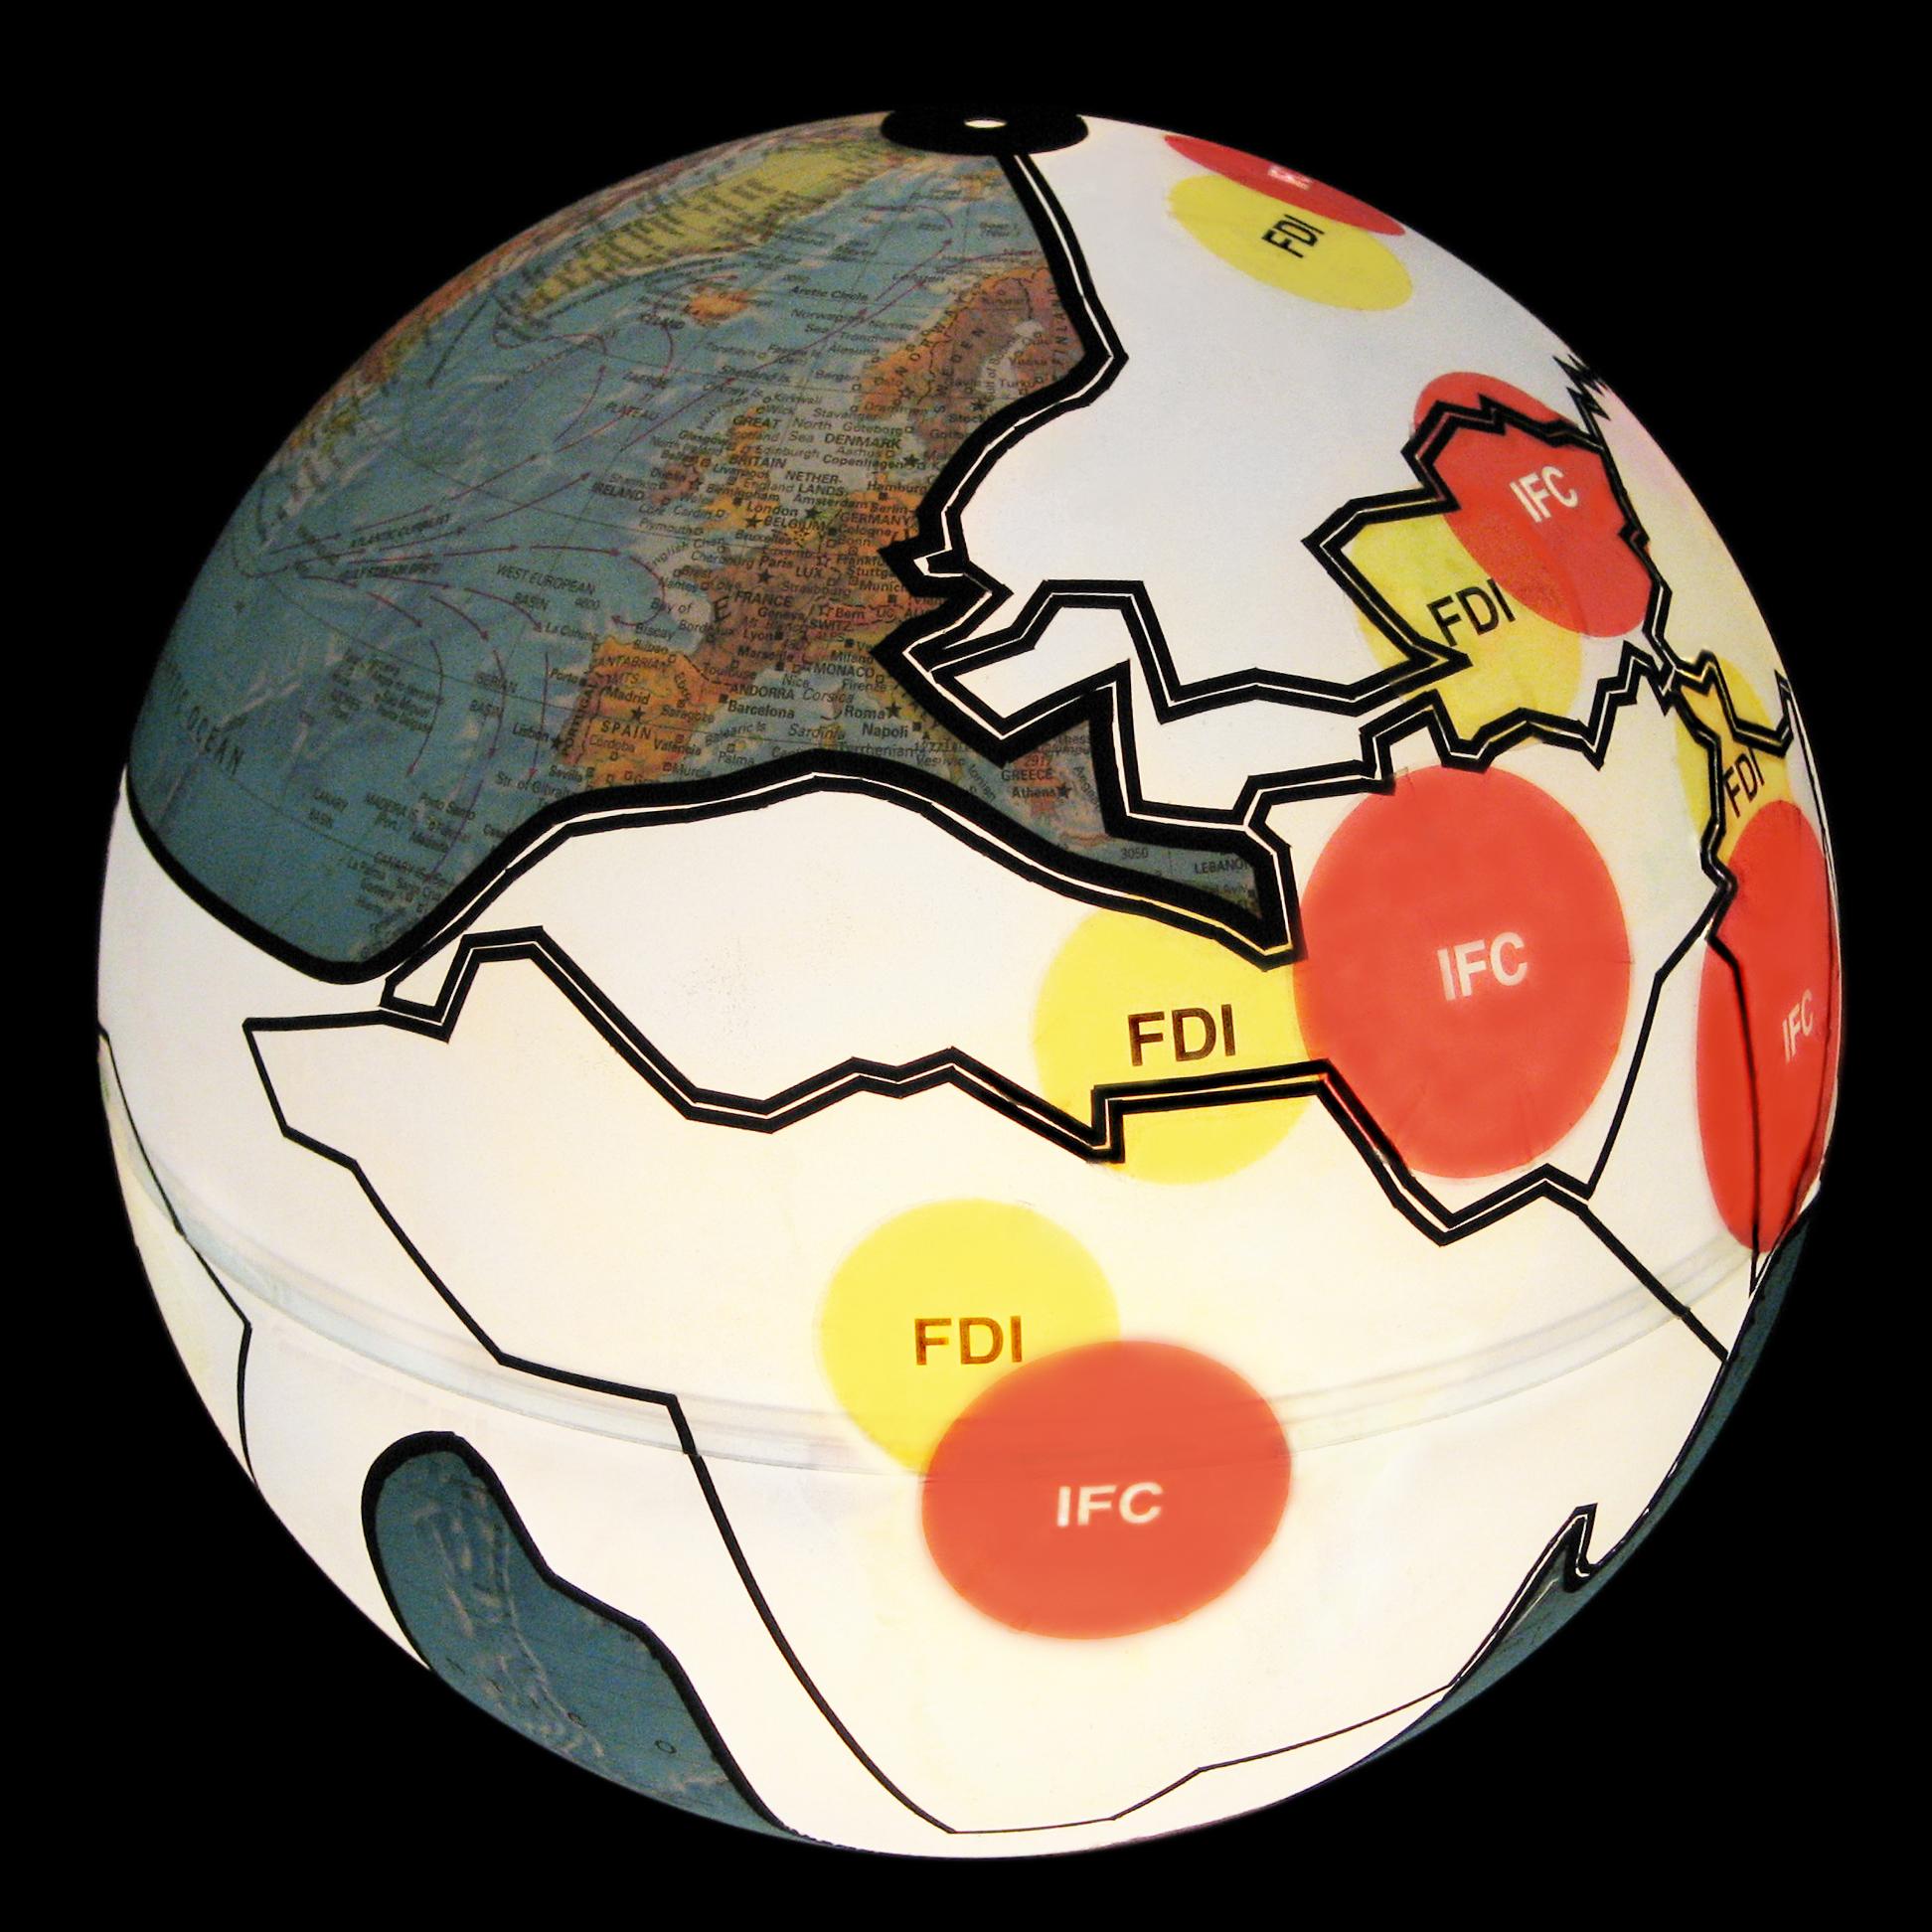 295_IFC_vs_FDI.AF.jpg